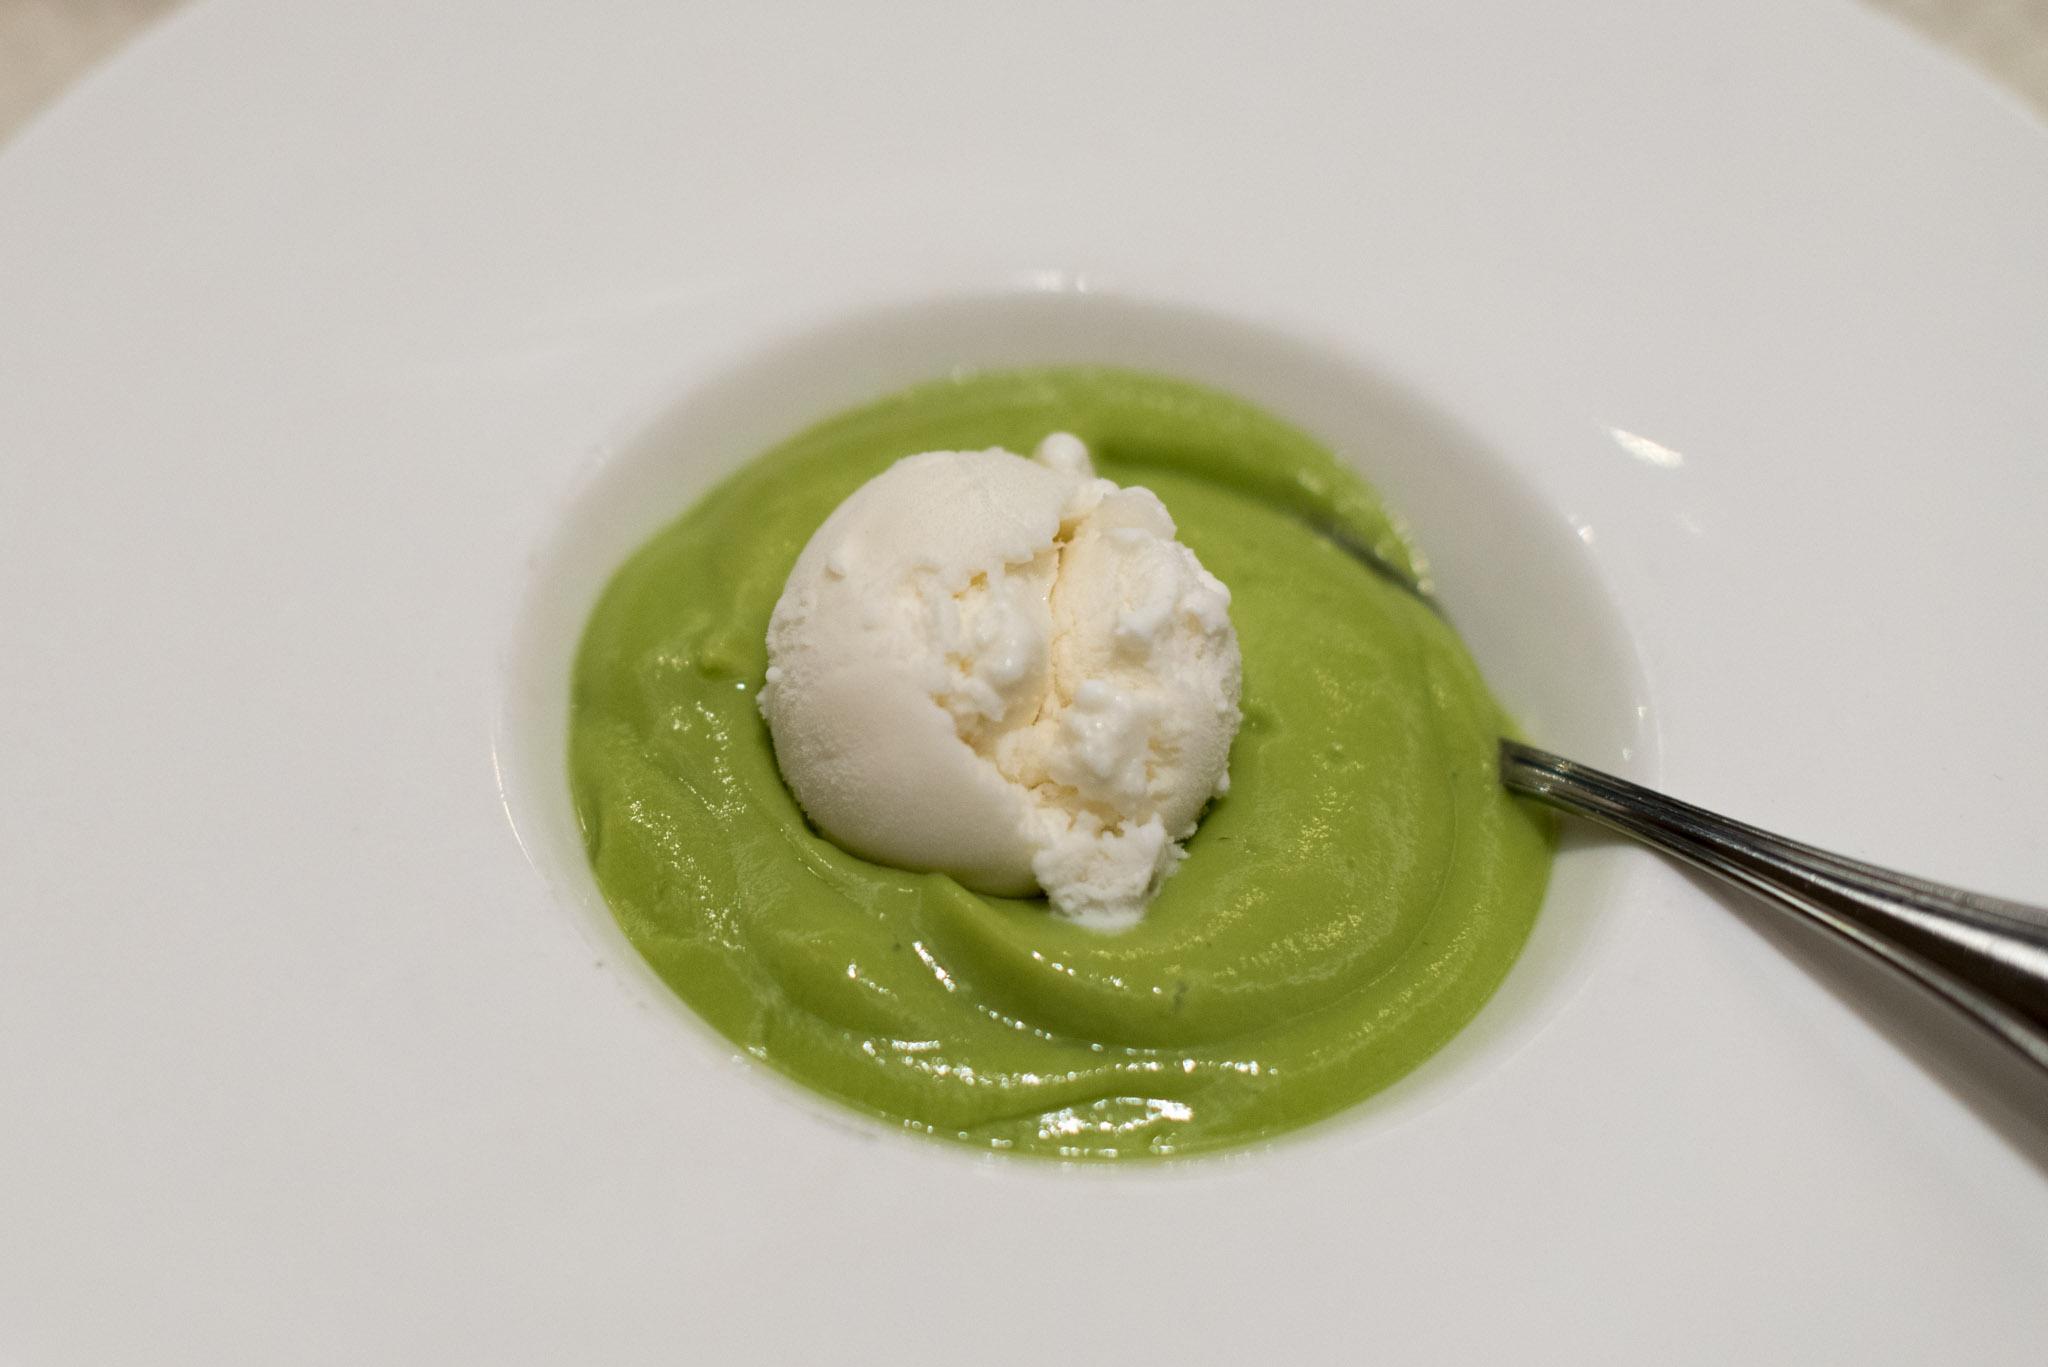 Ice-cream with Avocado Cream   Wah Lok - Carlton Hotel Singapore